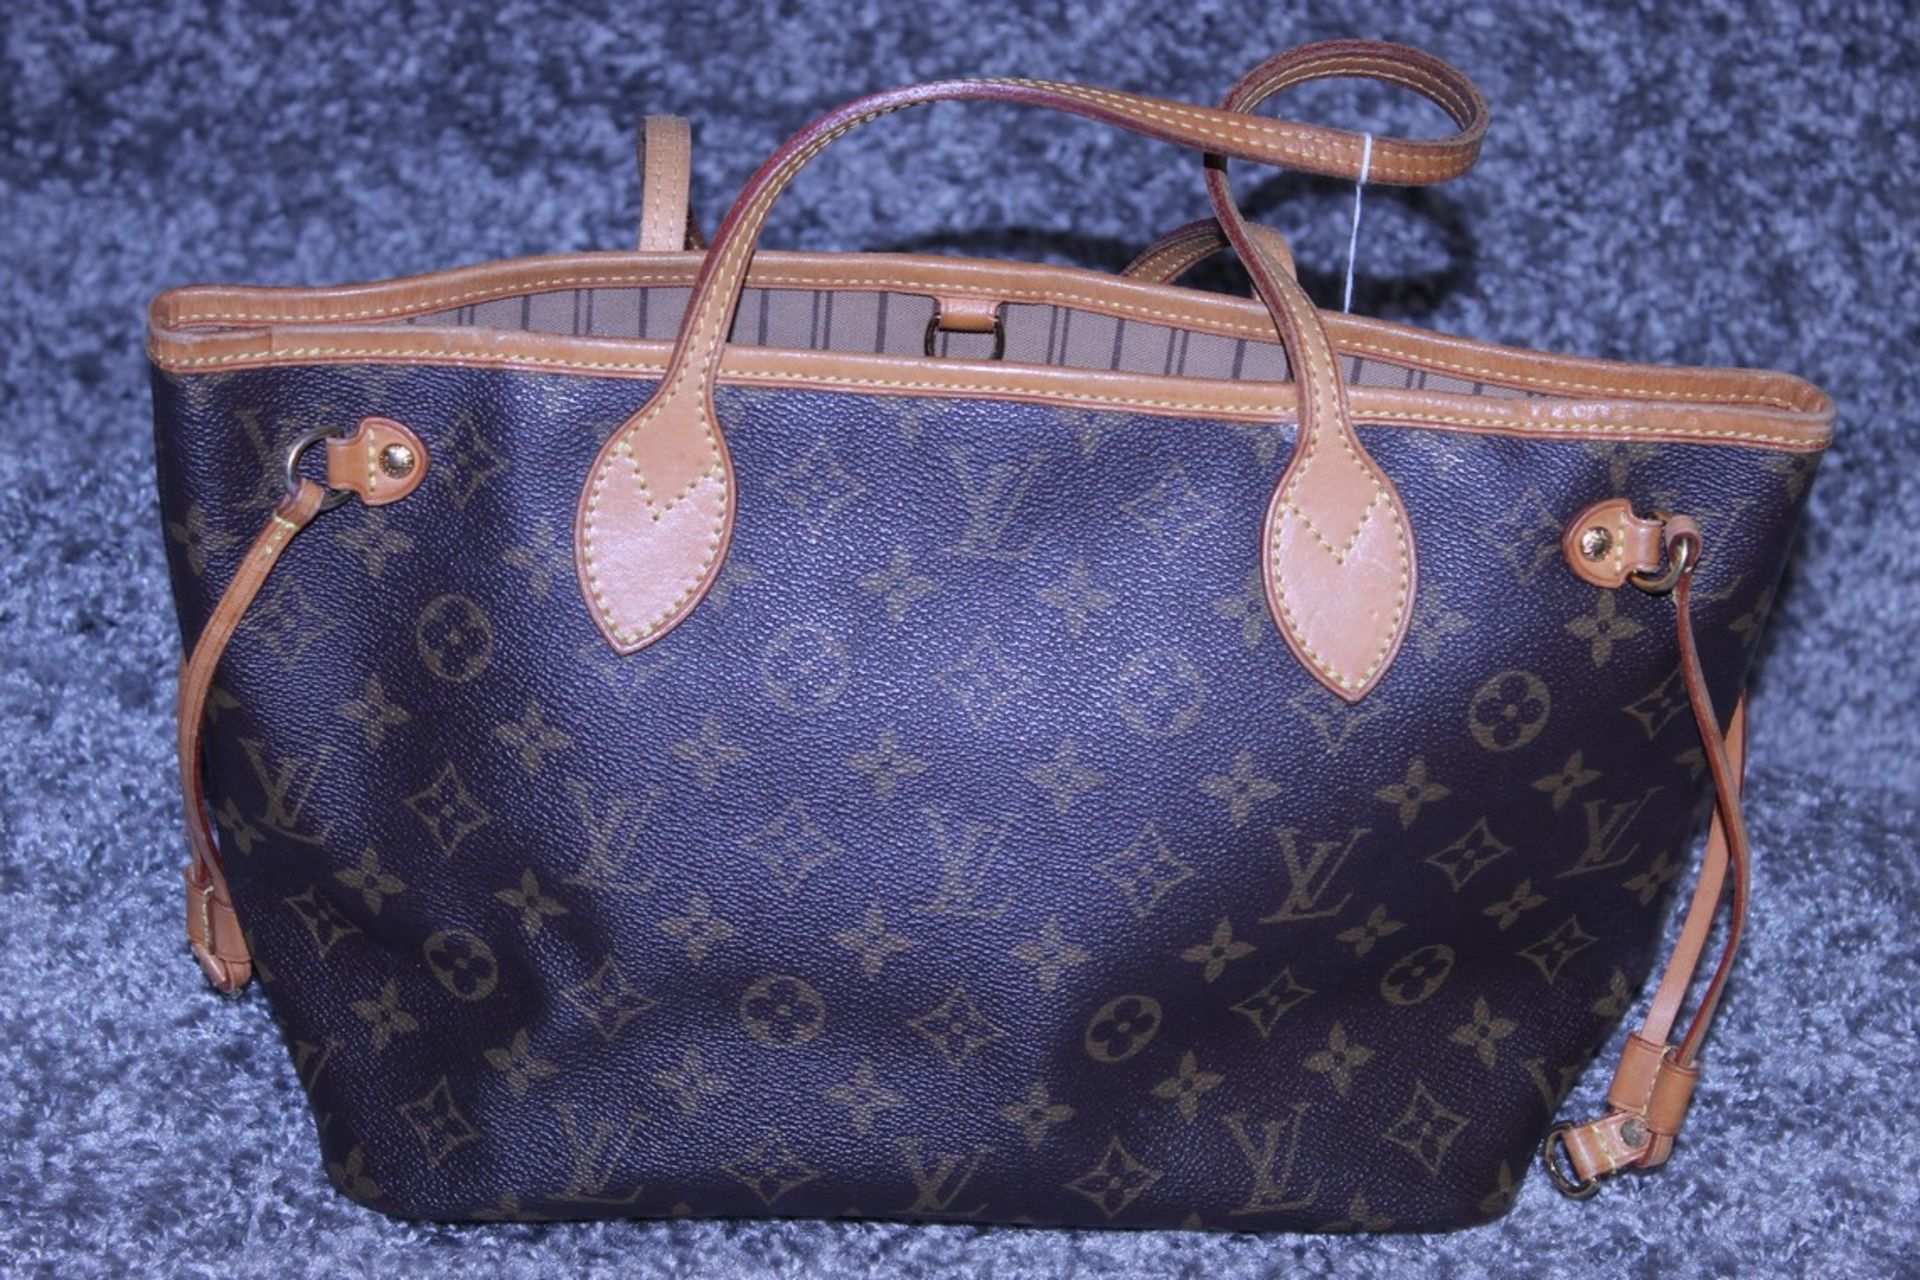 RRP £1,500 Louis Vuitton Neverfull Shoulder Bag, Brown Coated Monogram Canvas, 29X22X13Cm, ( - Image 2 of 3